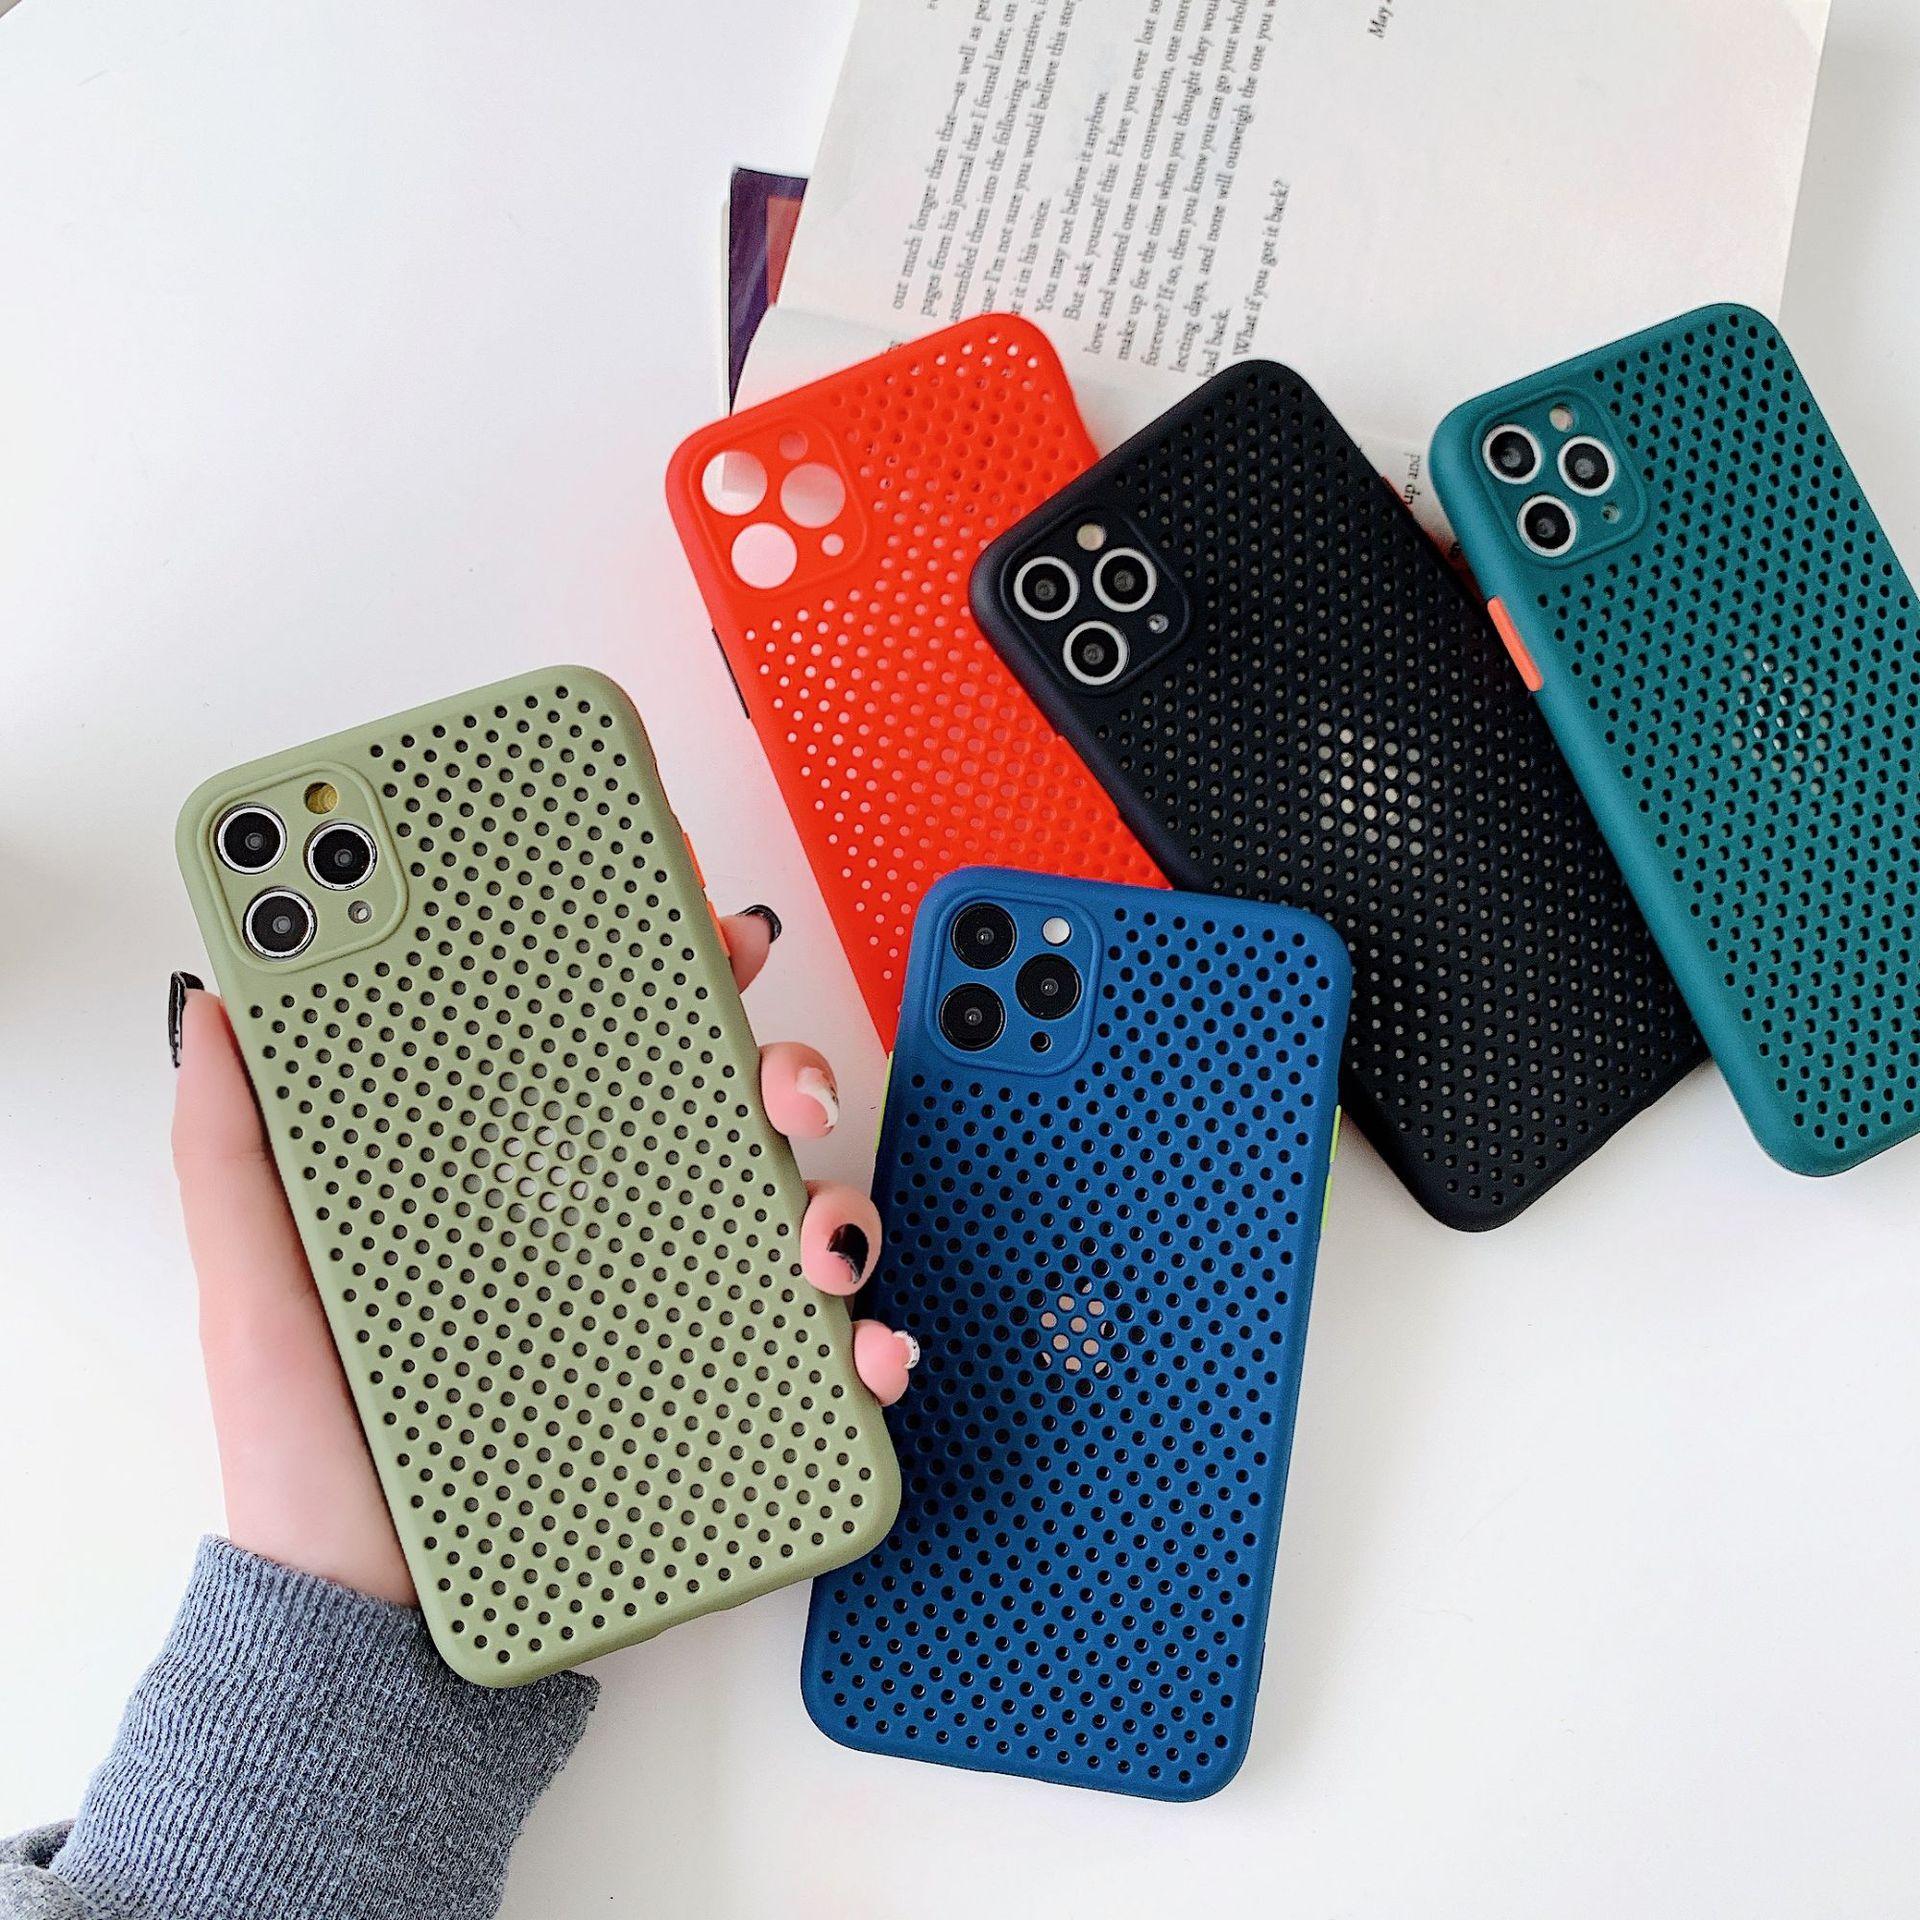 Zachte Tpu Plain Kleur Case Voor Iphones 11 11 Pro Max Xr Xs Max X 8 7 6S Plus 11 7 Warmteafvoer Ademend Cooling Telefoon Case